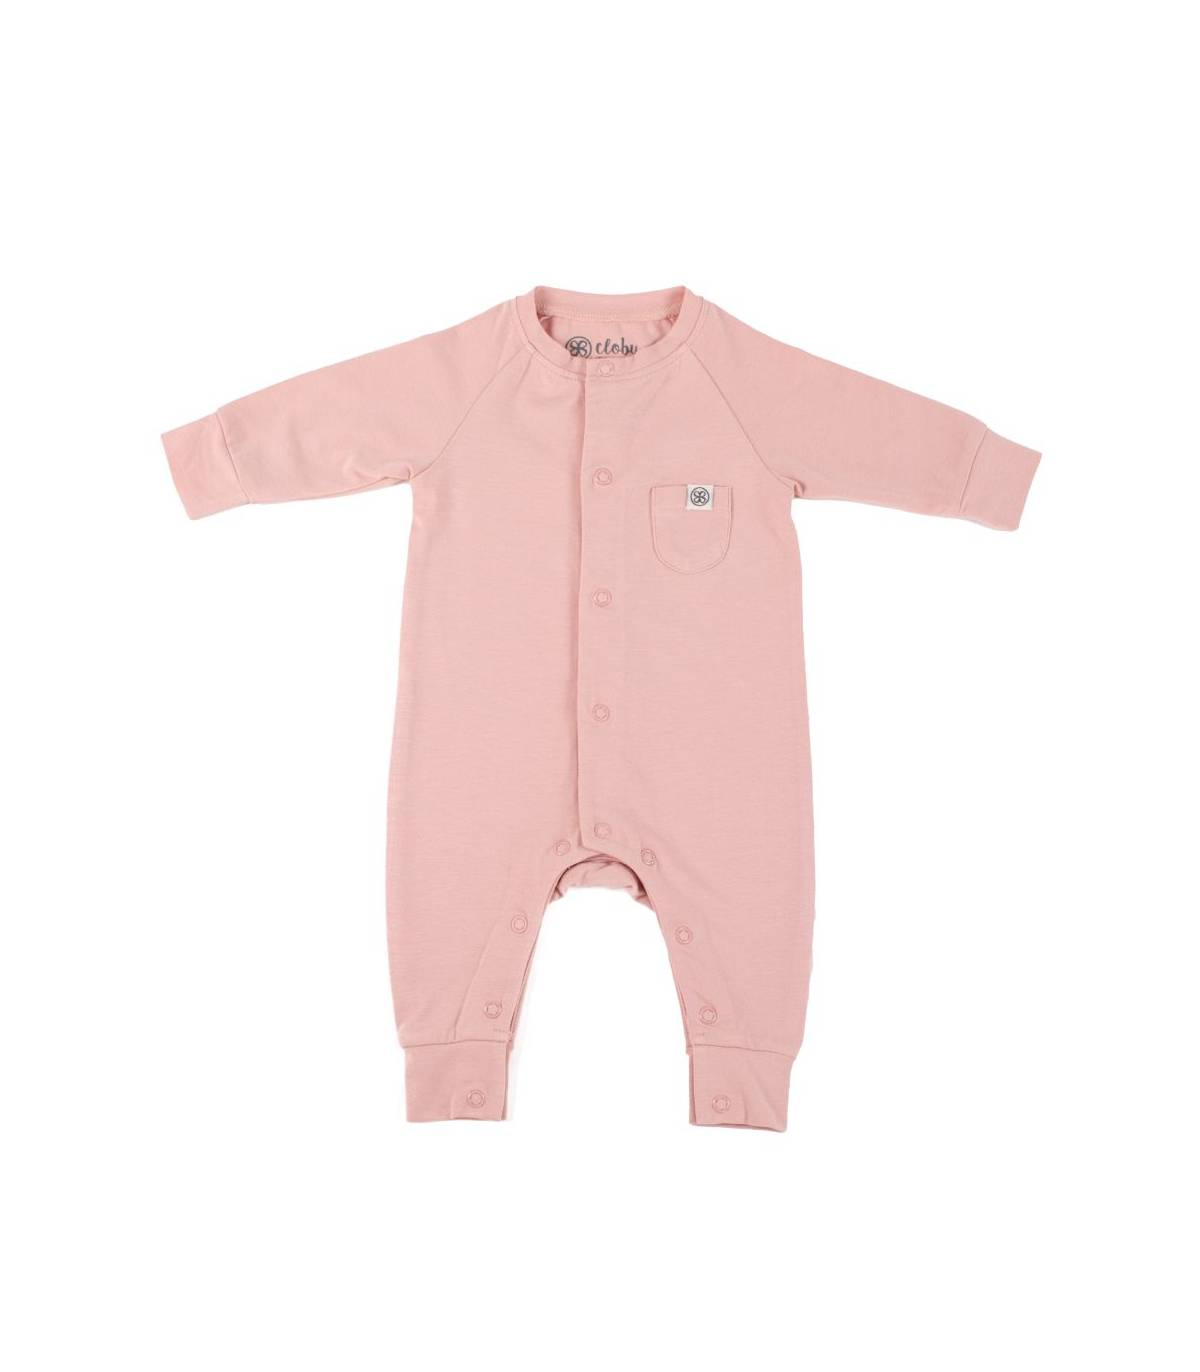 Cloby UV Baby Overall Misty Rose